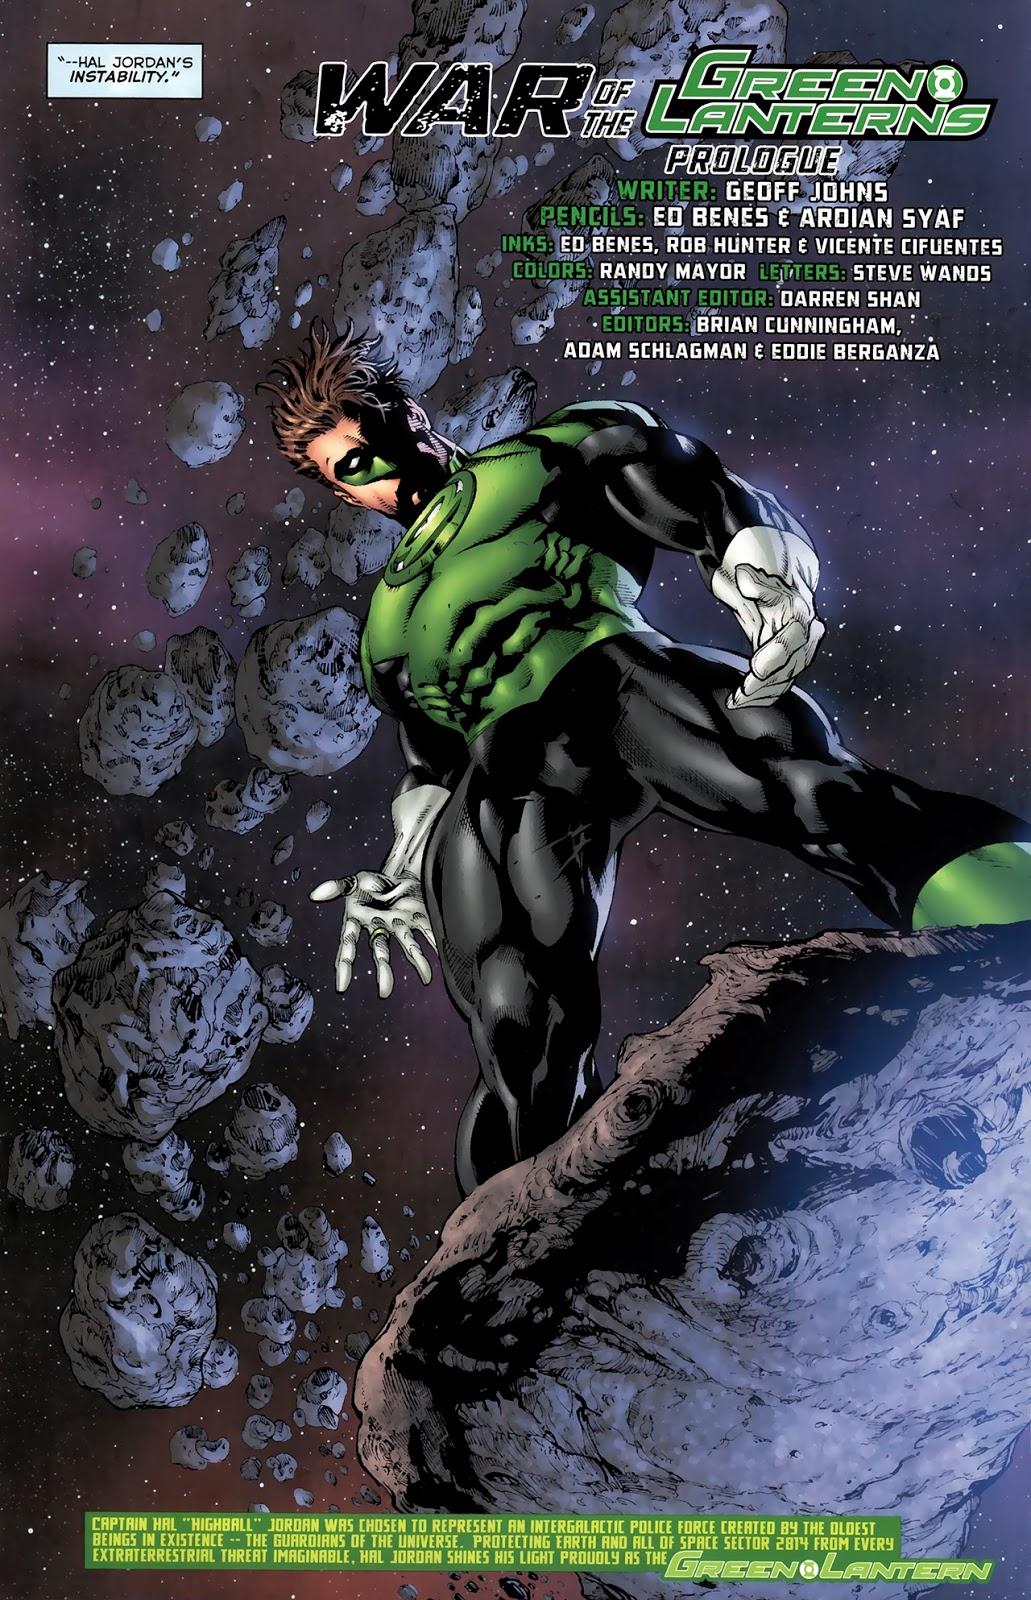 Green Lantern Hal Jordan (Green Lantern Vol. 4 #63)